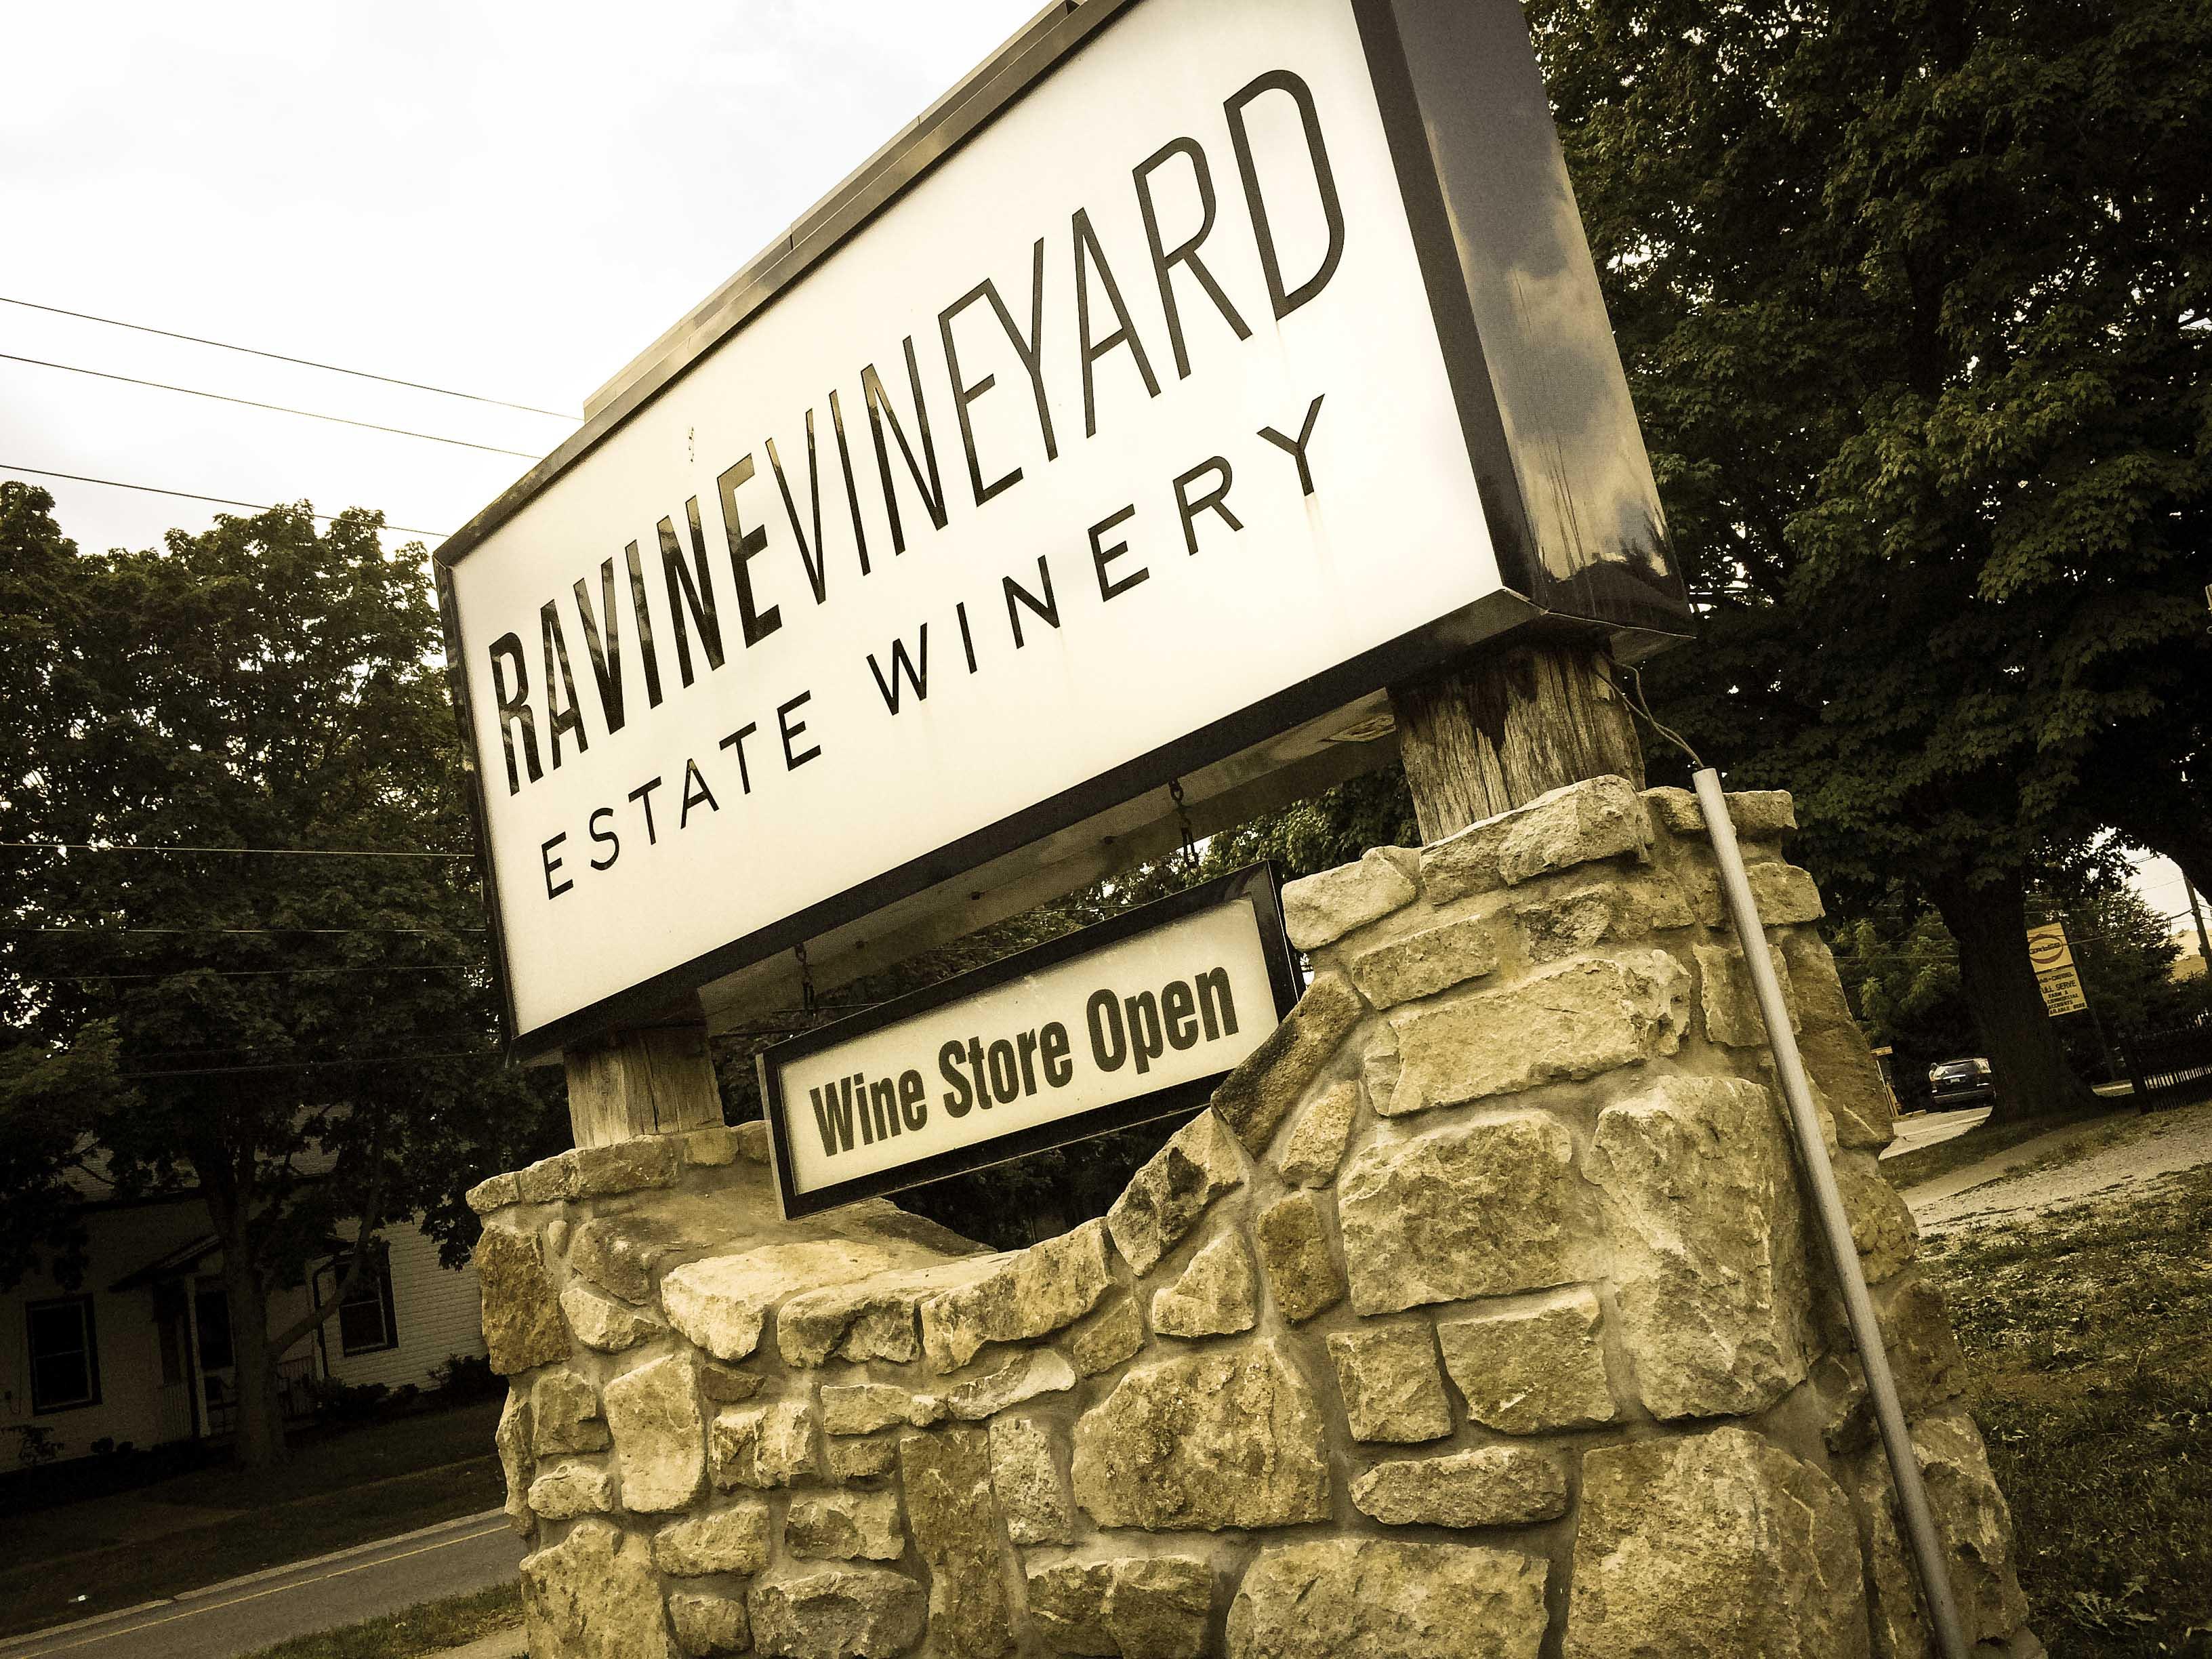 Entrance to Ravine Vineyard Estate Winery